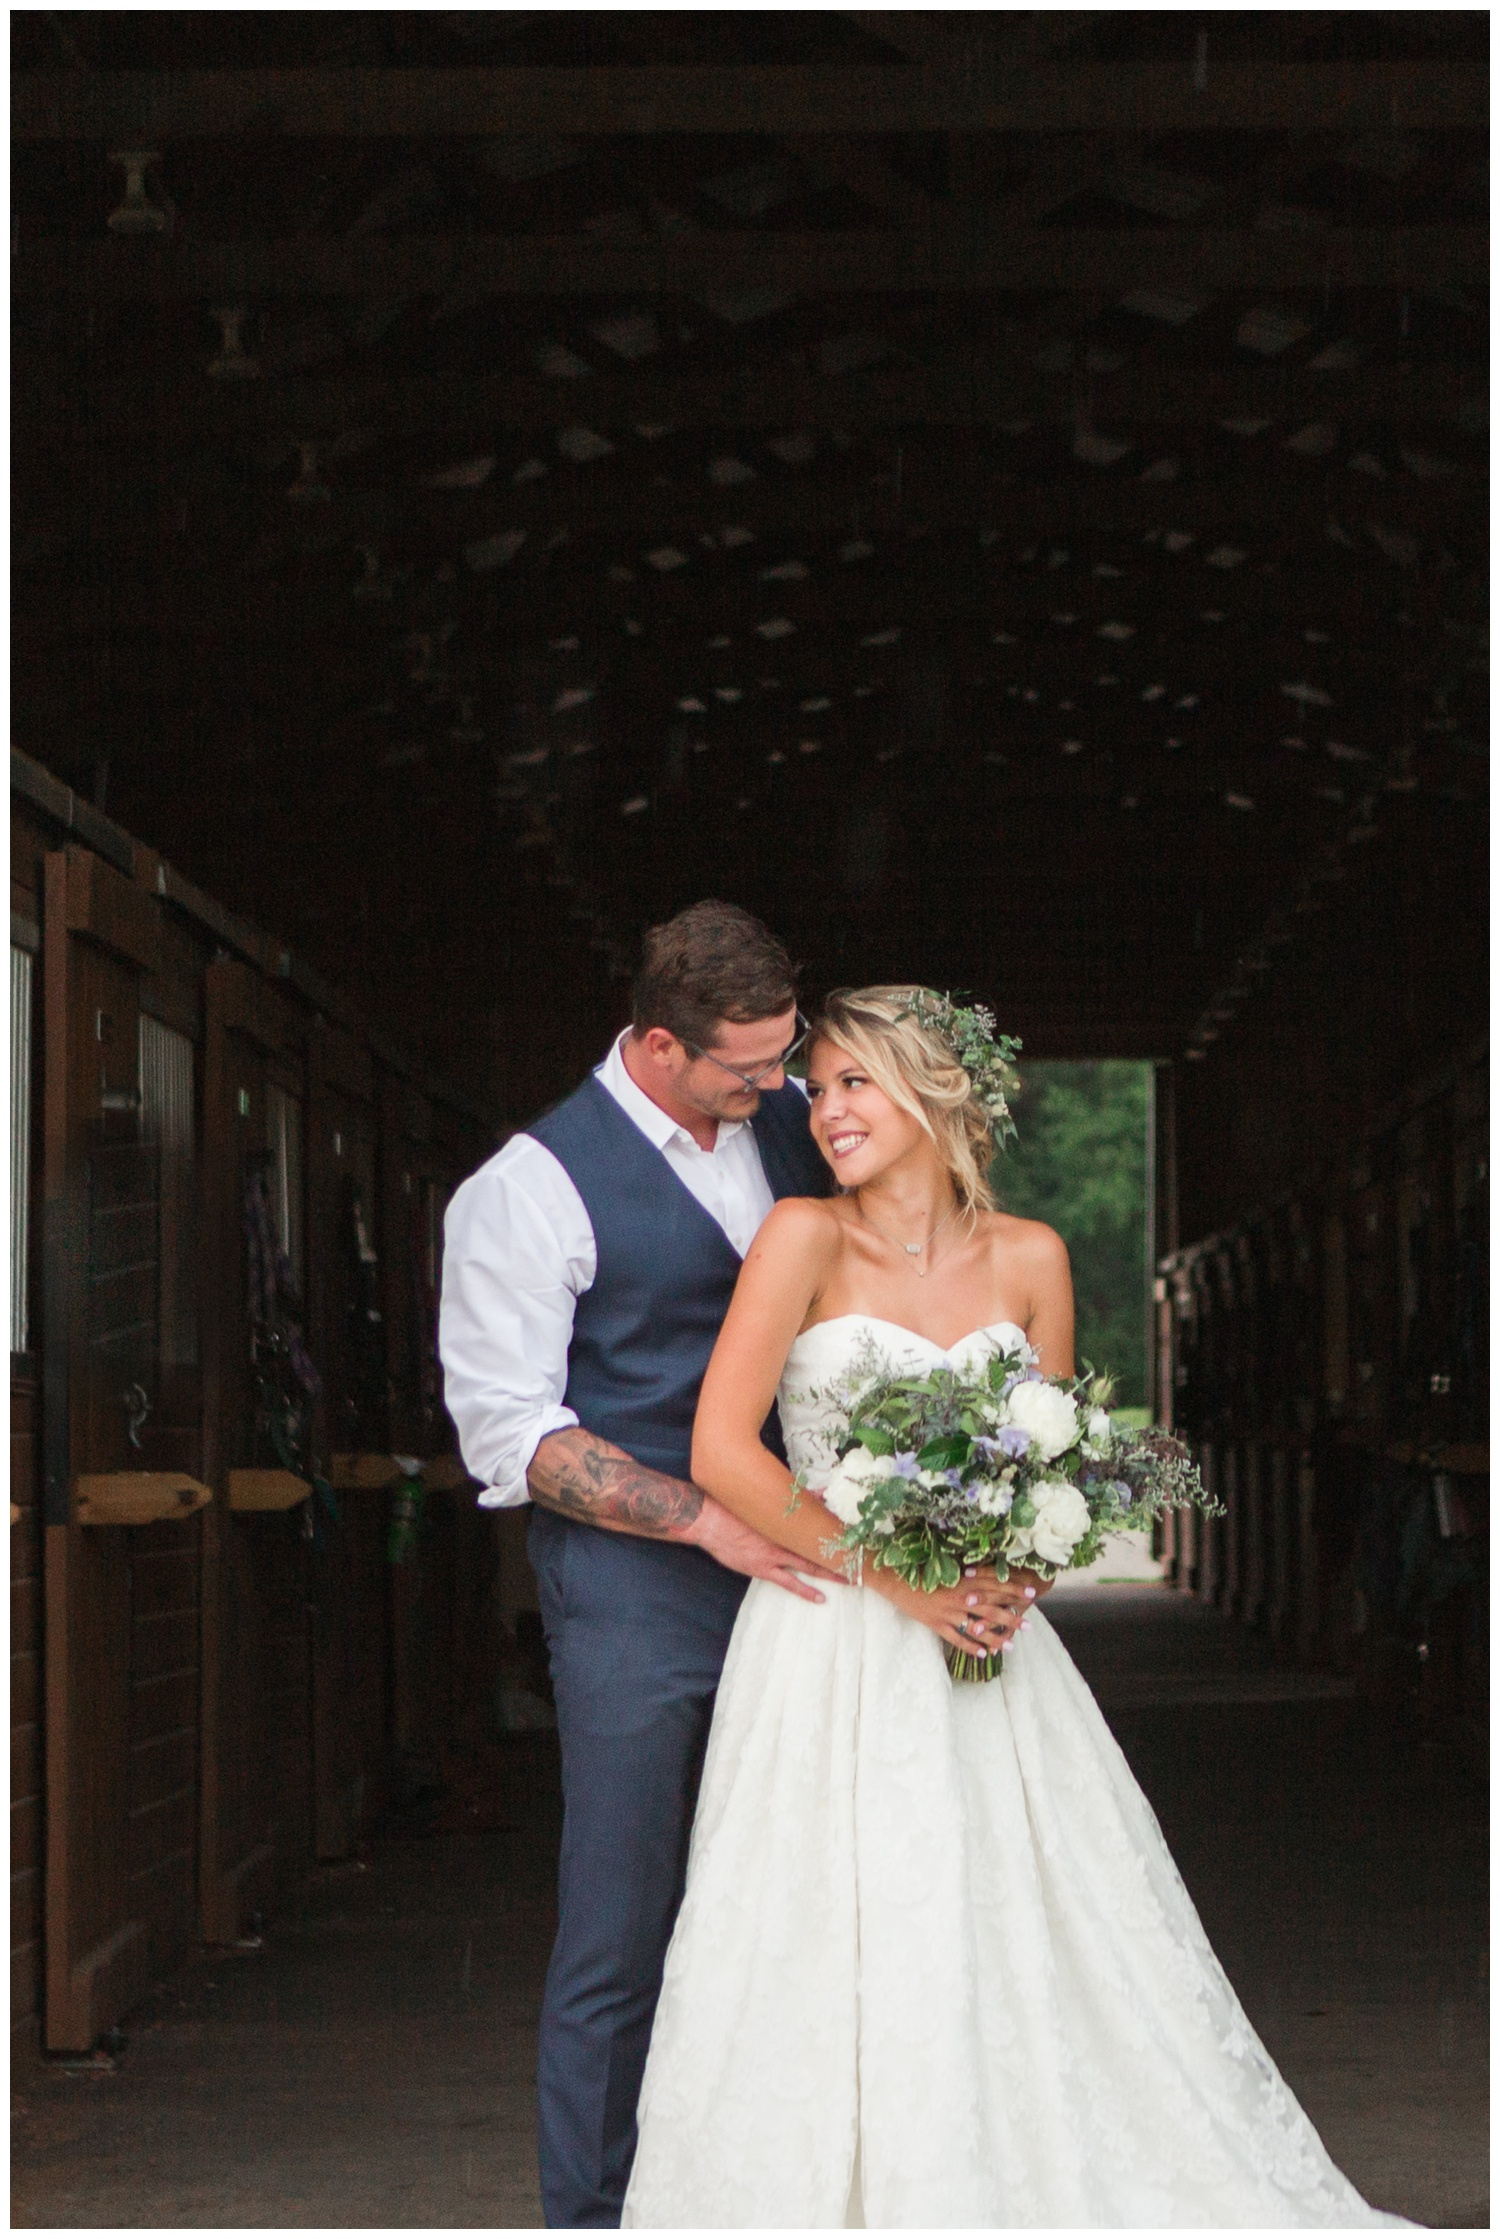 meghan marie studio wedding photographer ohio dayton cincinnati columbus outdoor rural vintage rustic DIY wedding country chic pinterest bridal gown beauty_0688.jpg